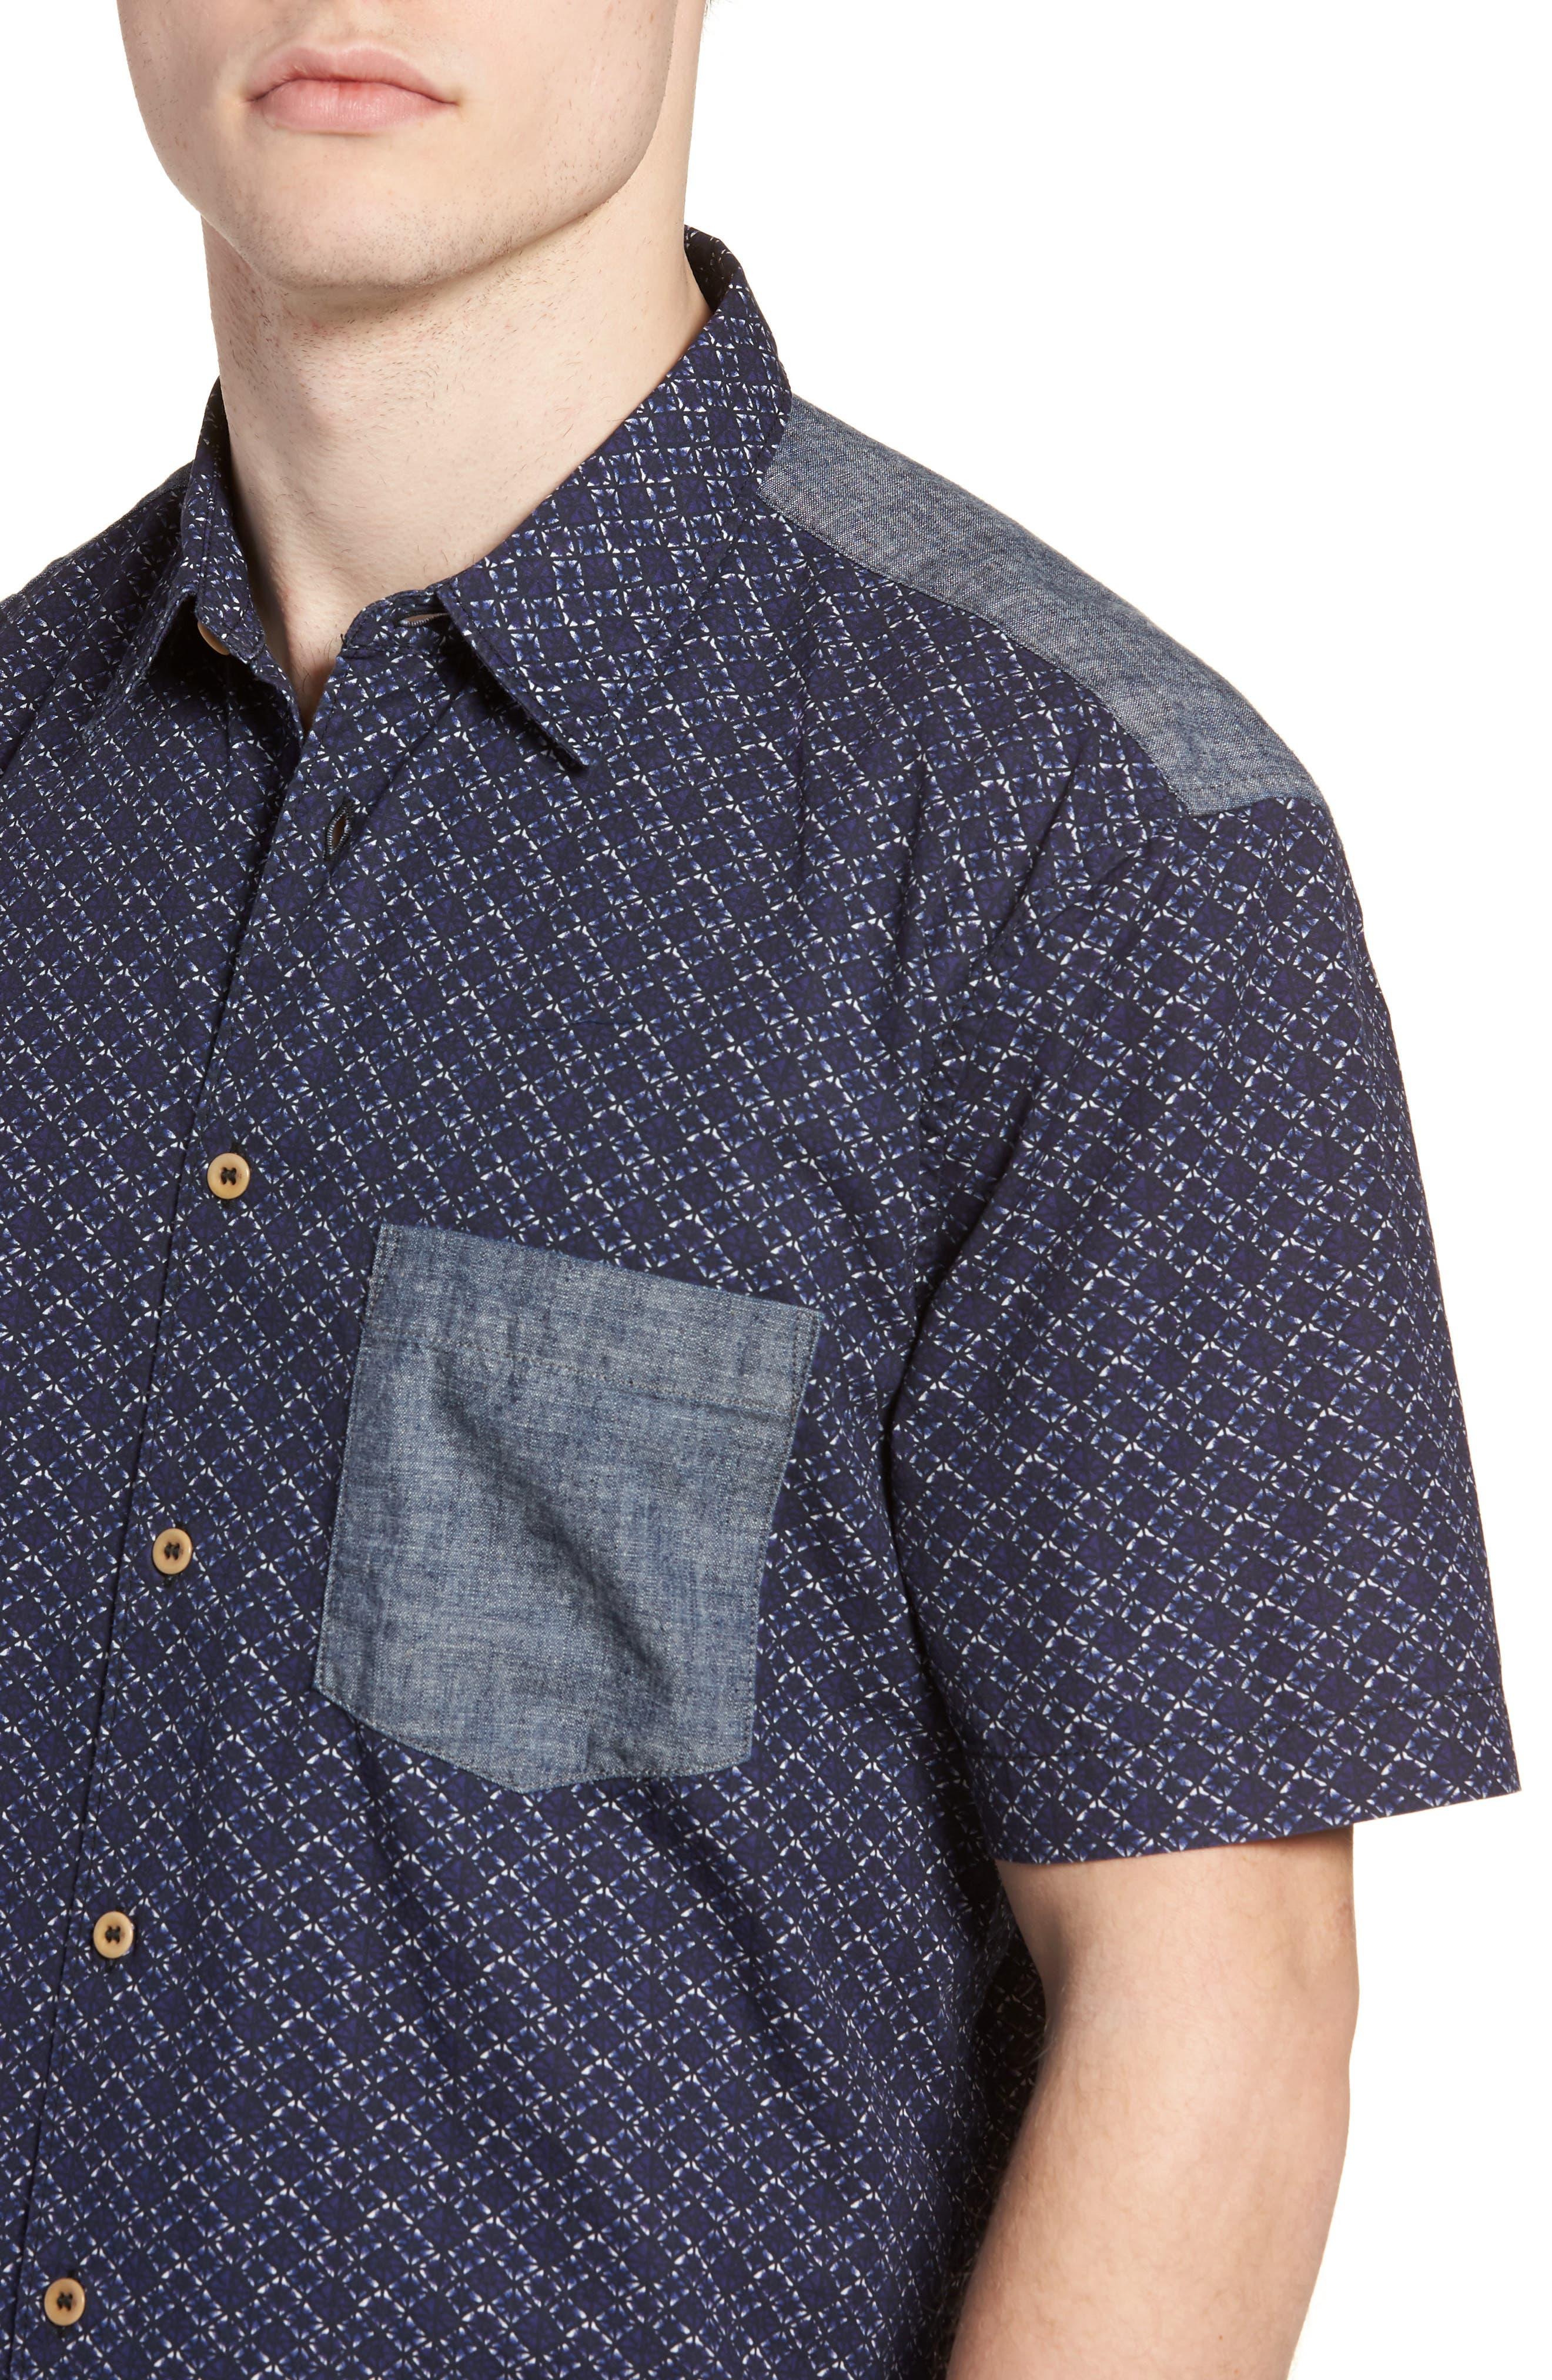 Kast Relaxed Fit Short Sleeve Sport Shirt,                             Alternate thumbnail 4, color,                             Deep Cobalt